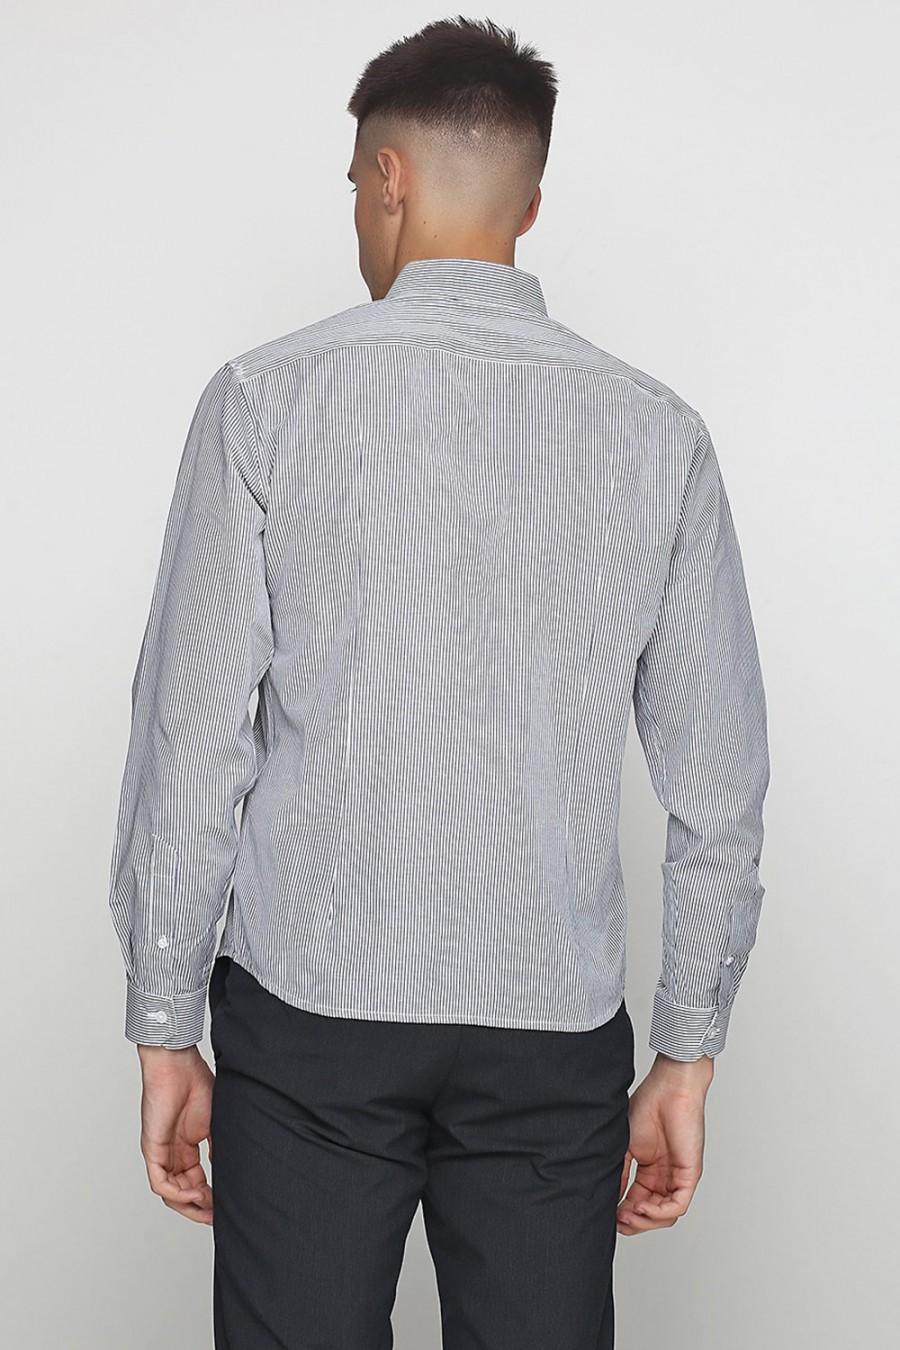 Мужская рубашка S-119-14